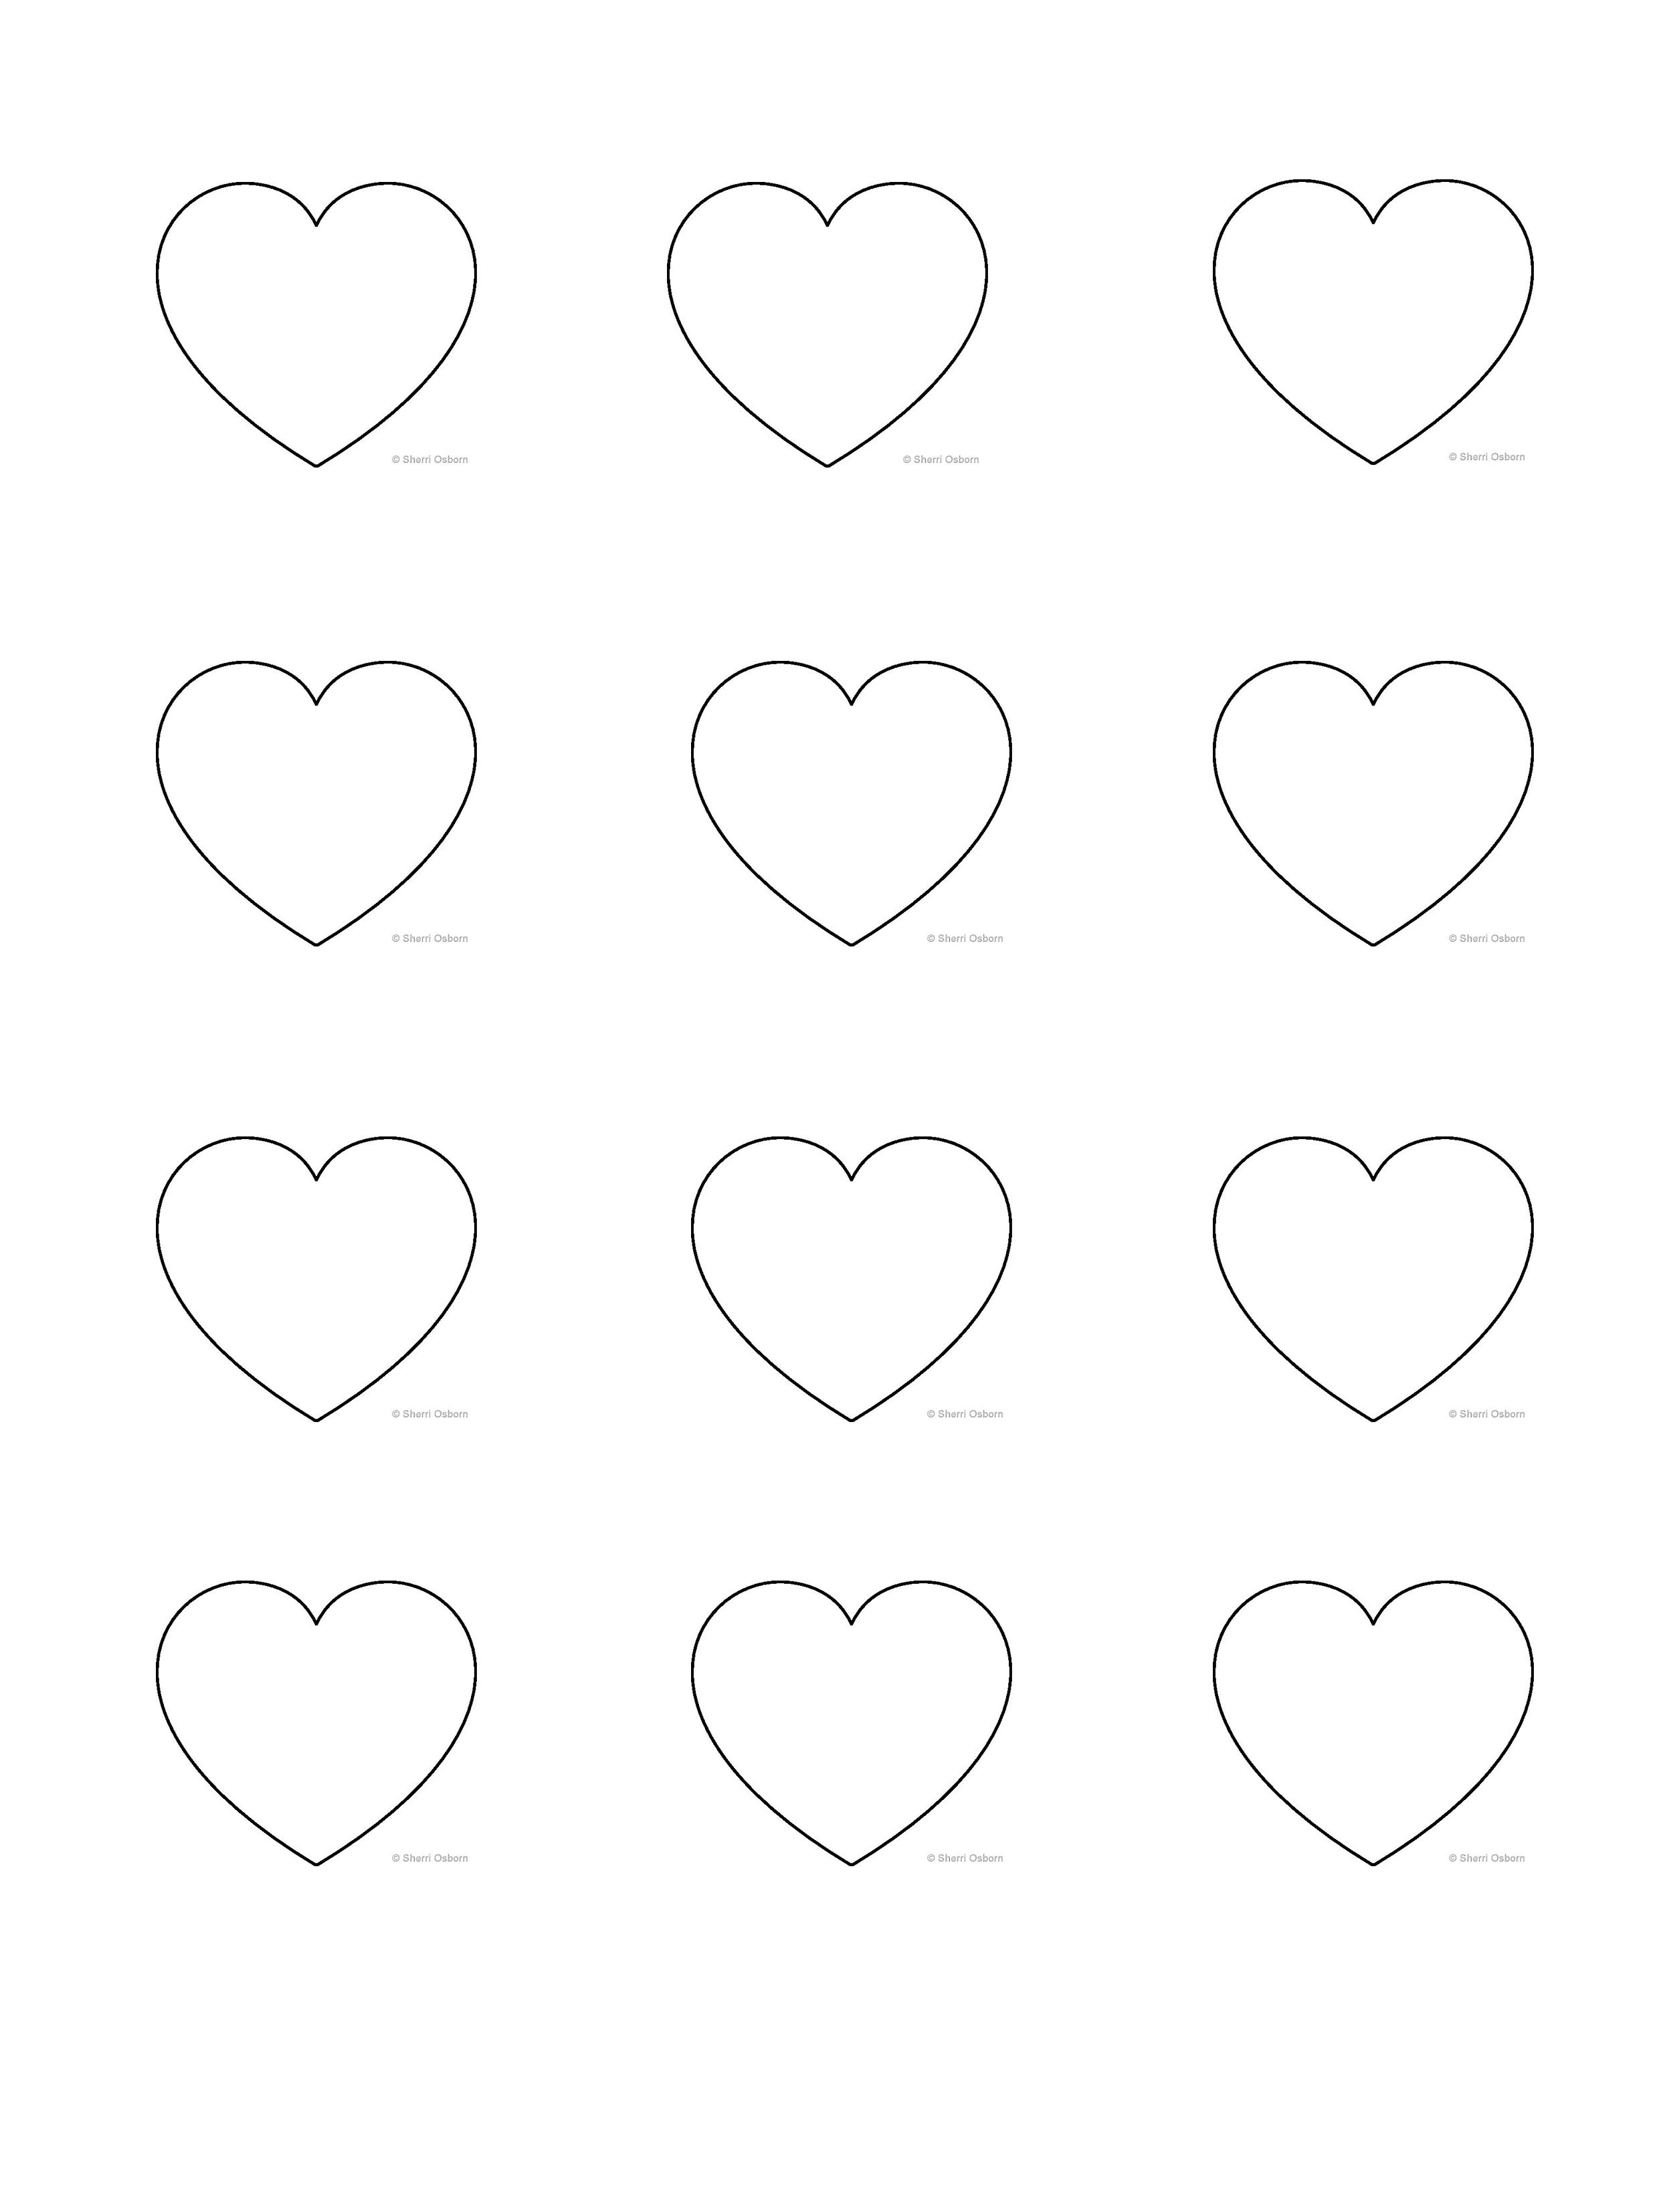 heart shape template 3 8cm french macarons pinterest heart